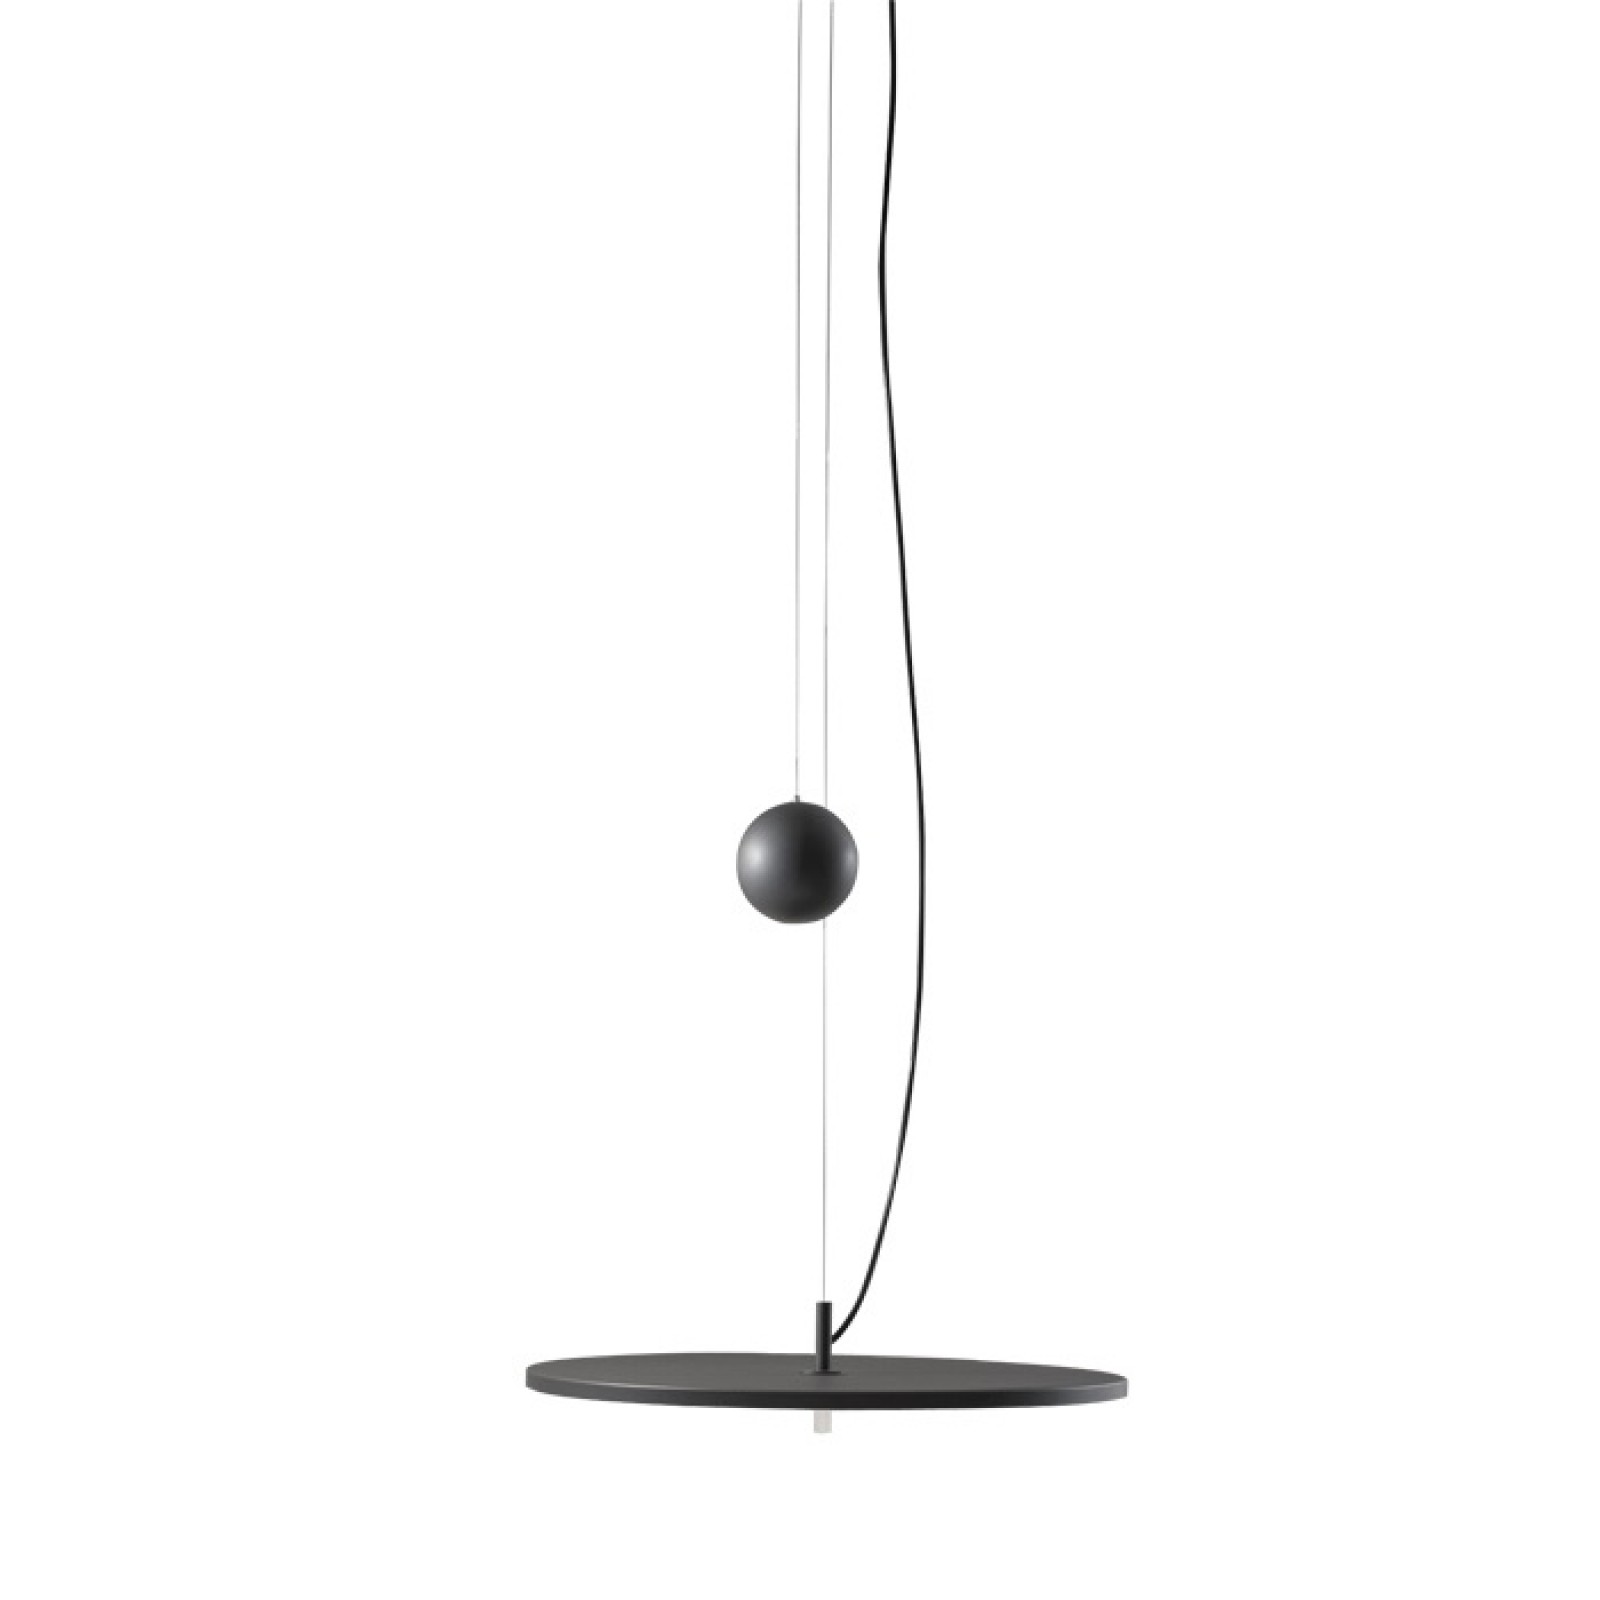 BlancoWhite D1 / D2 Ceiling - Hanging LED Lamp - Santa & Cole